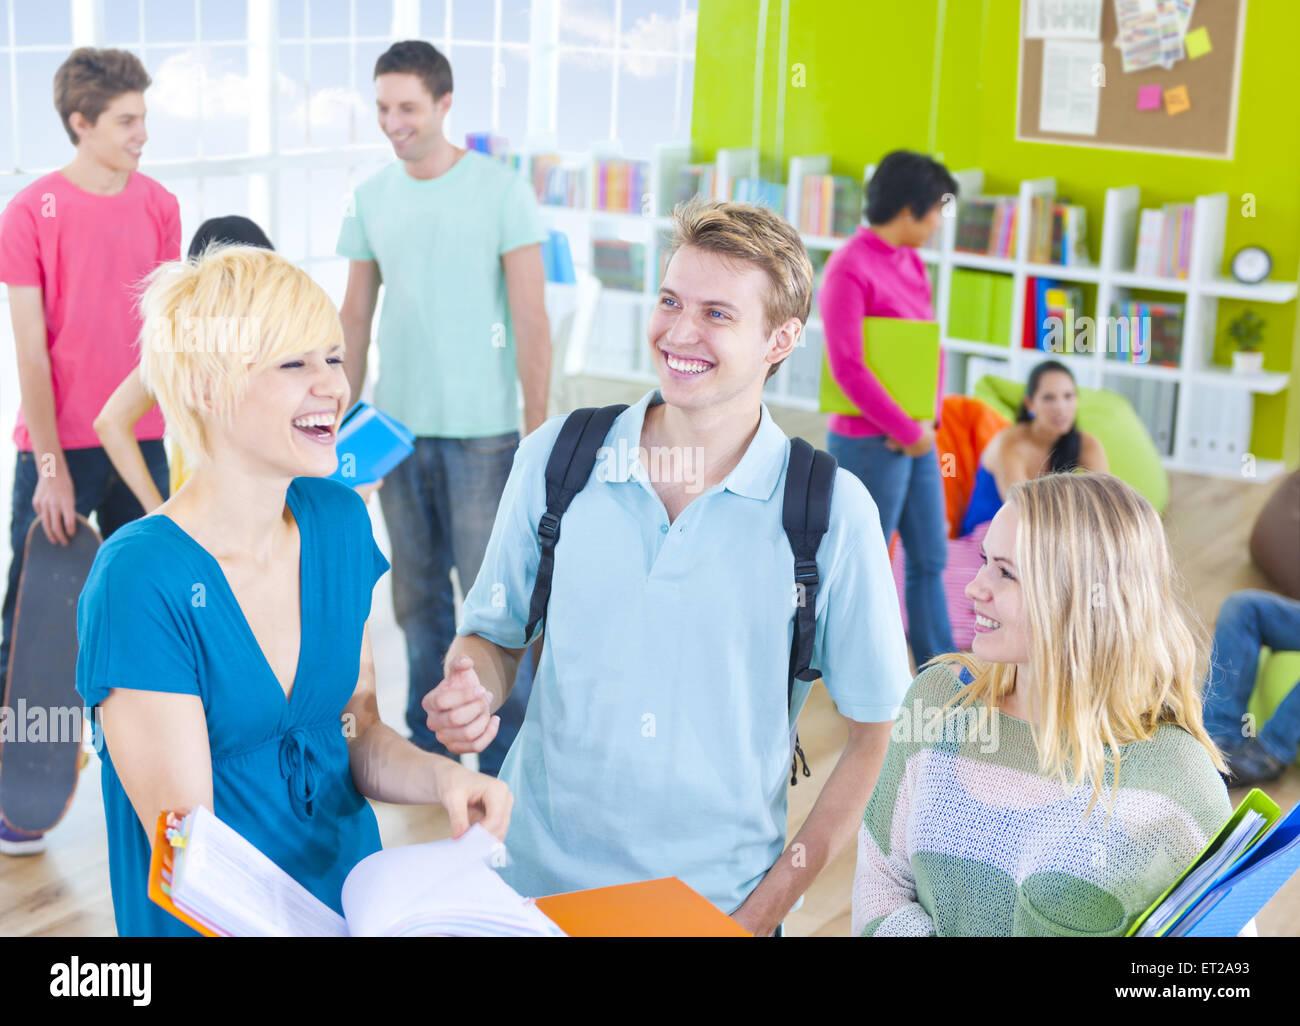 Grupo de Estudiantes en el aula Foto de stock